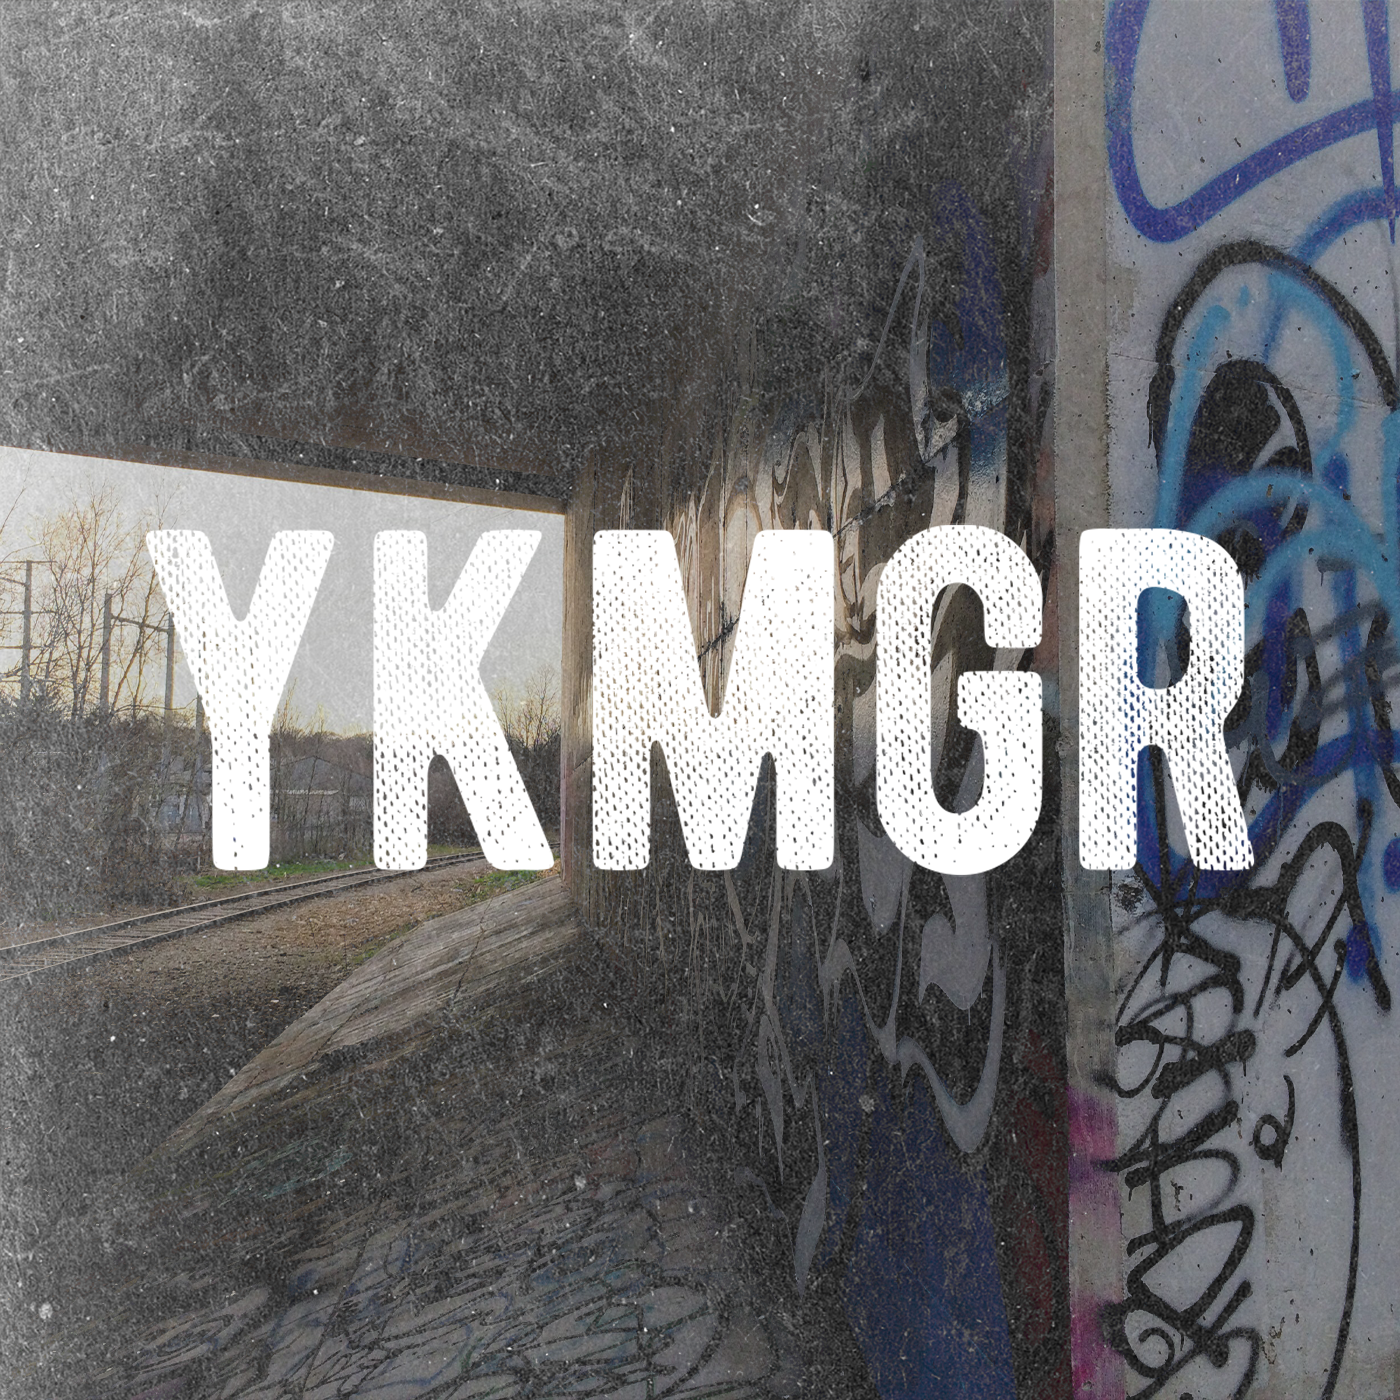 YKMGR 11.png